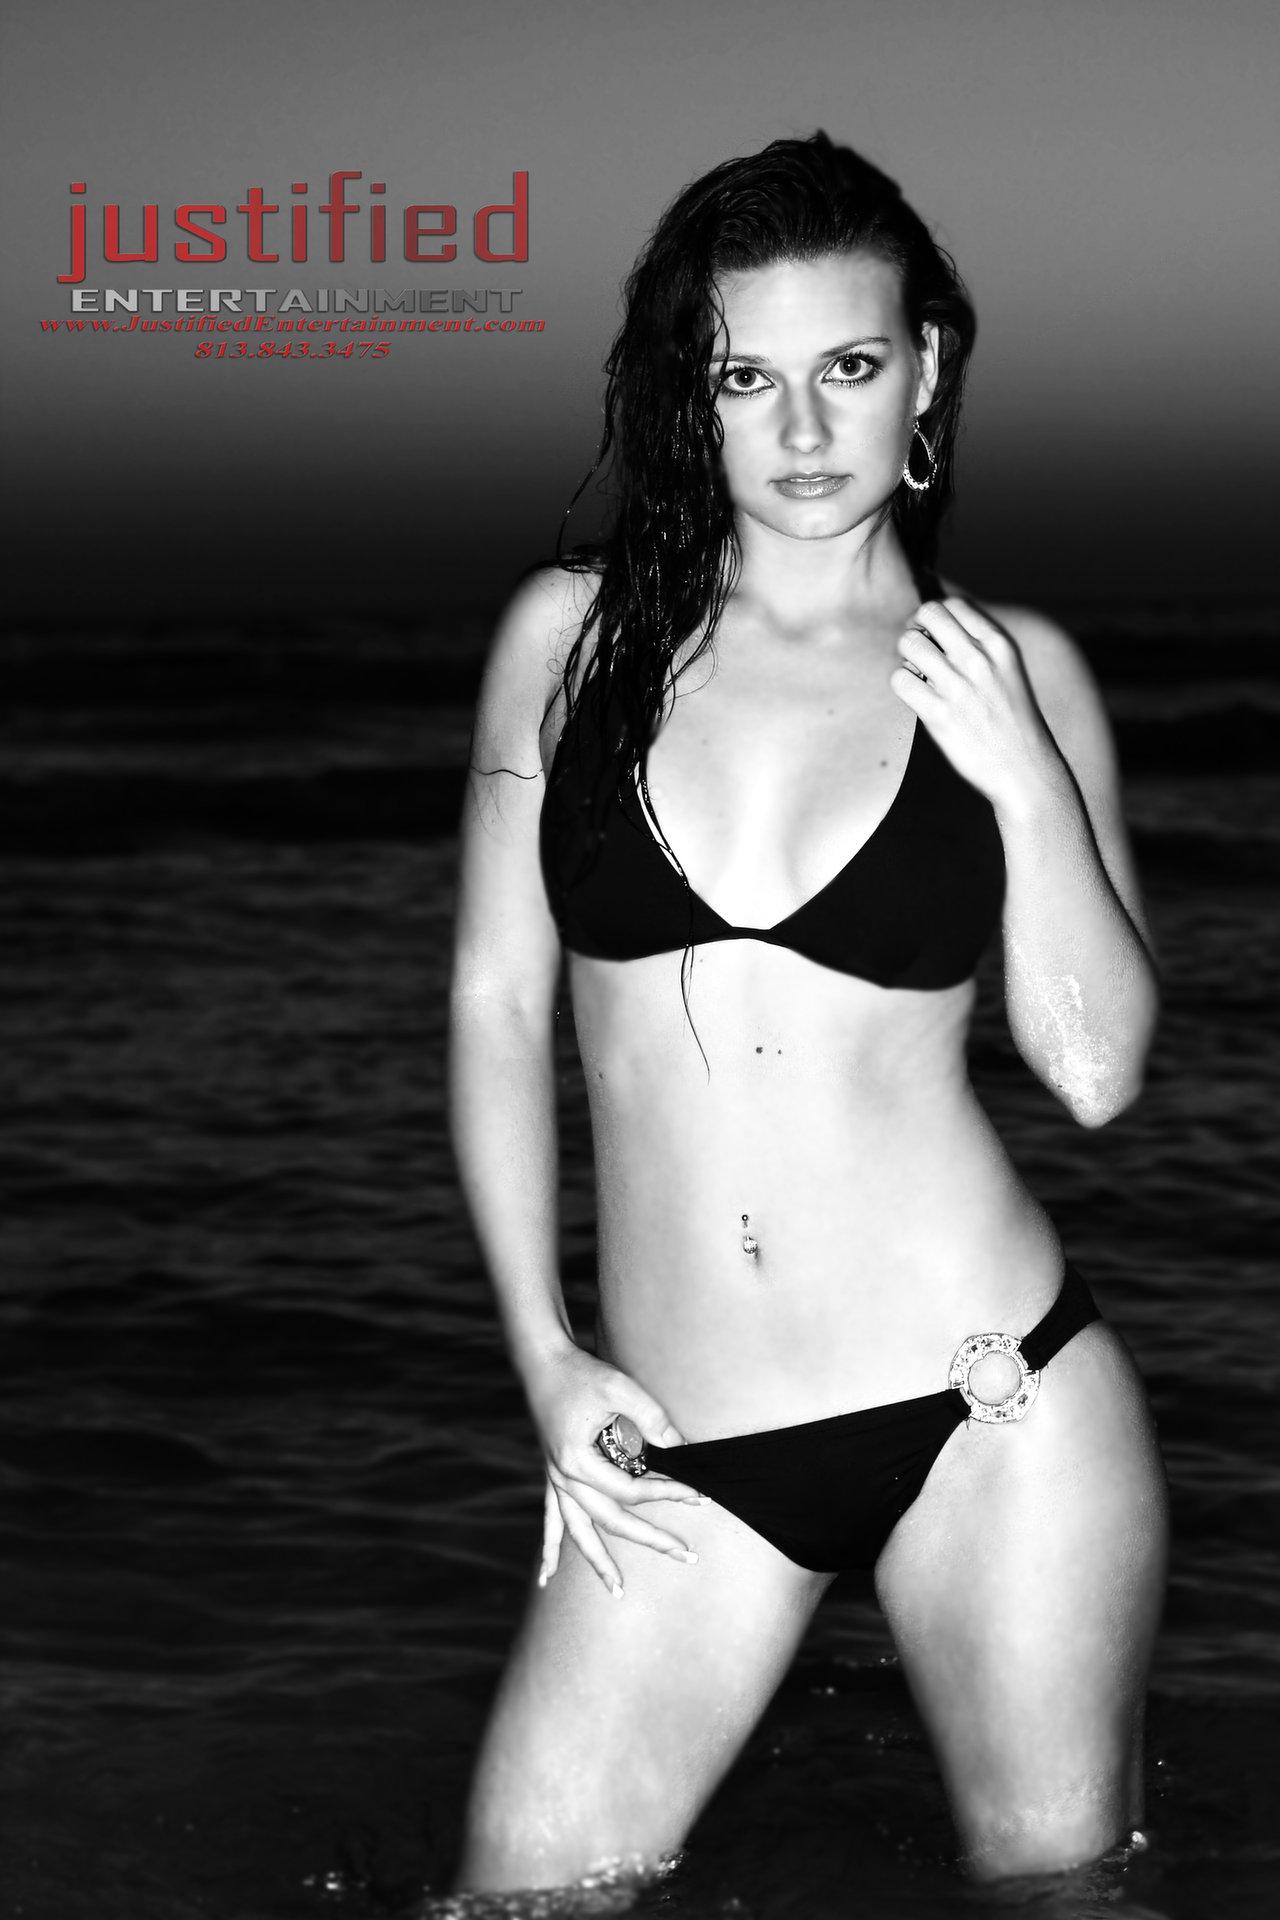 Amanda Mccain - swimsuit - ryan justice